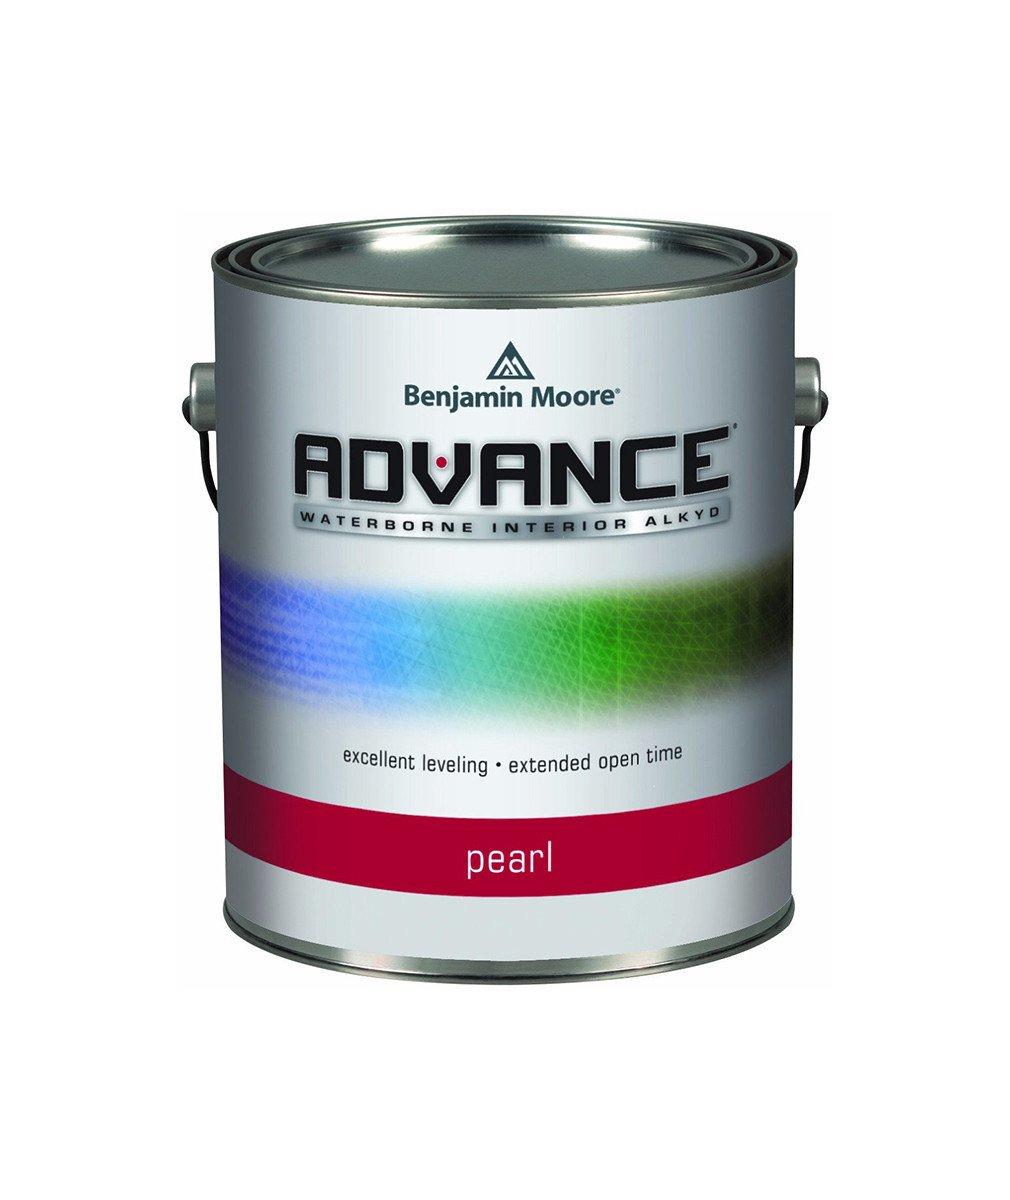 Advance_Pearl_2000x.jpg